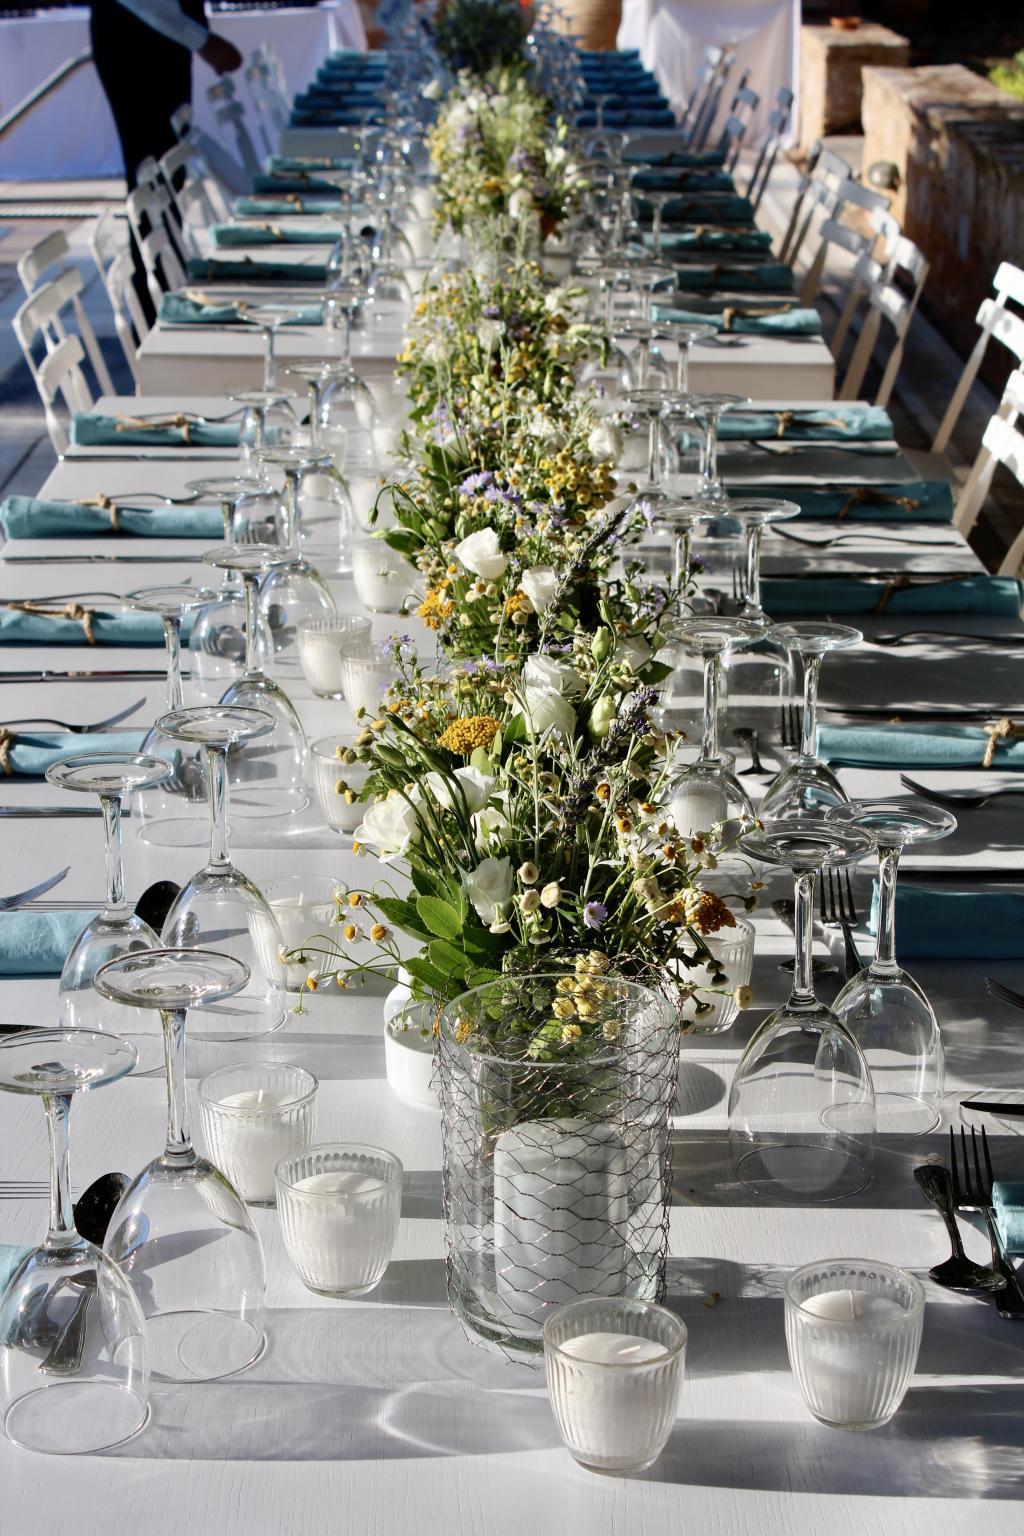 D&G Sounio wedding - Image 4